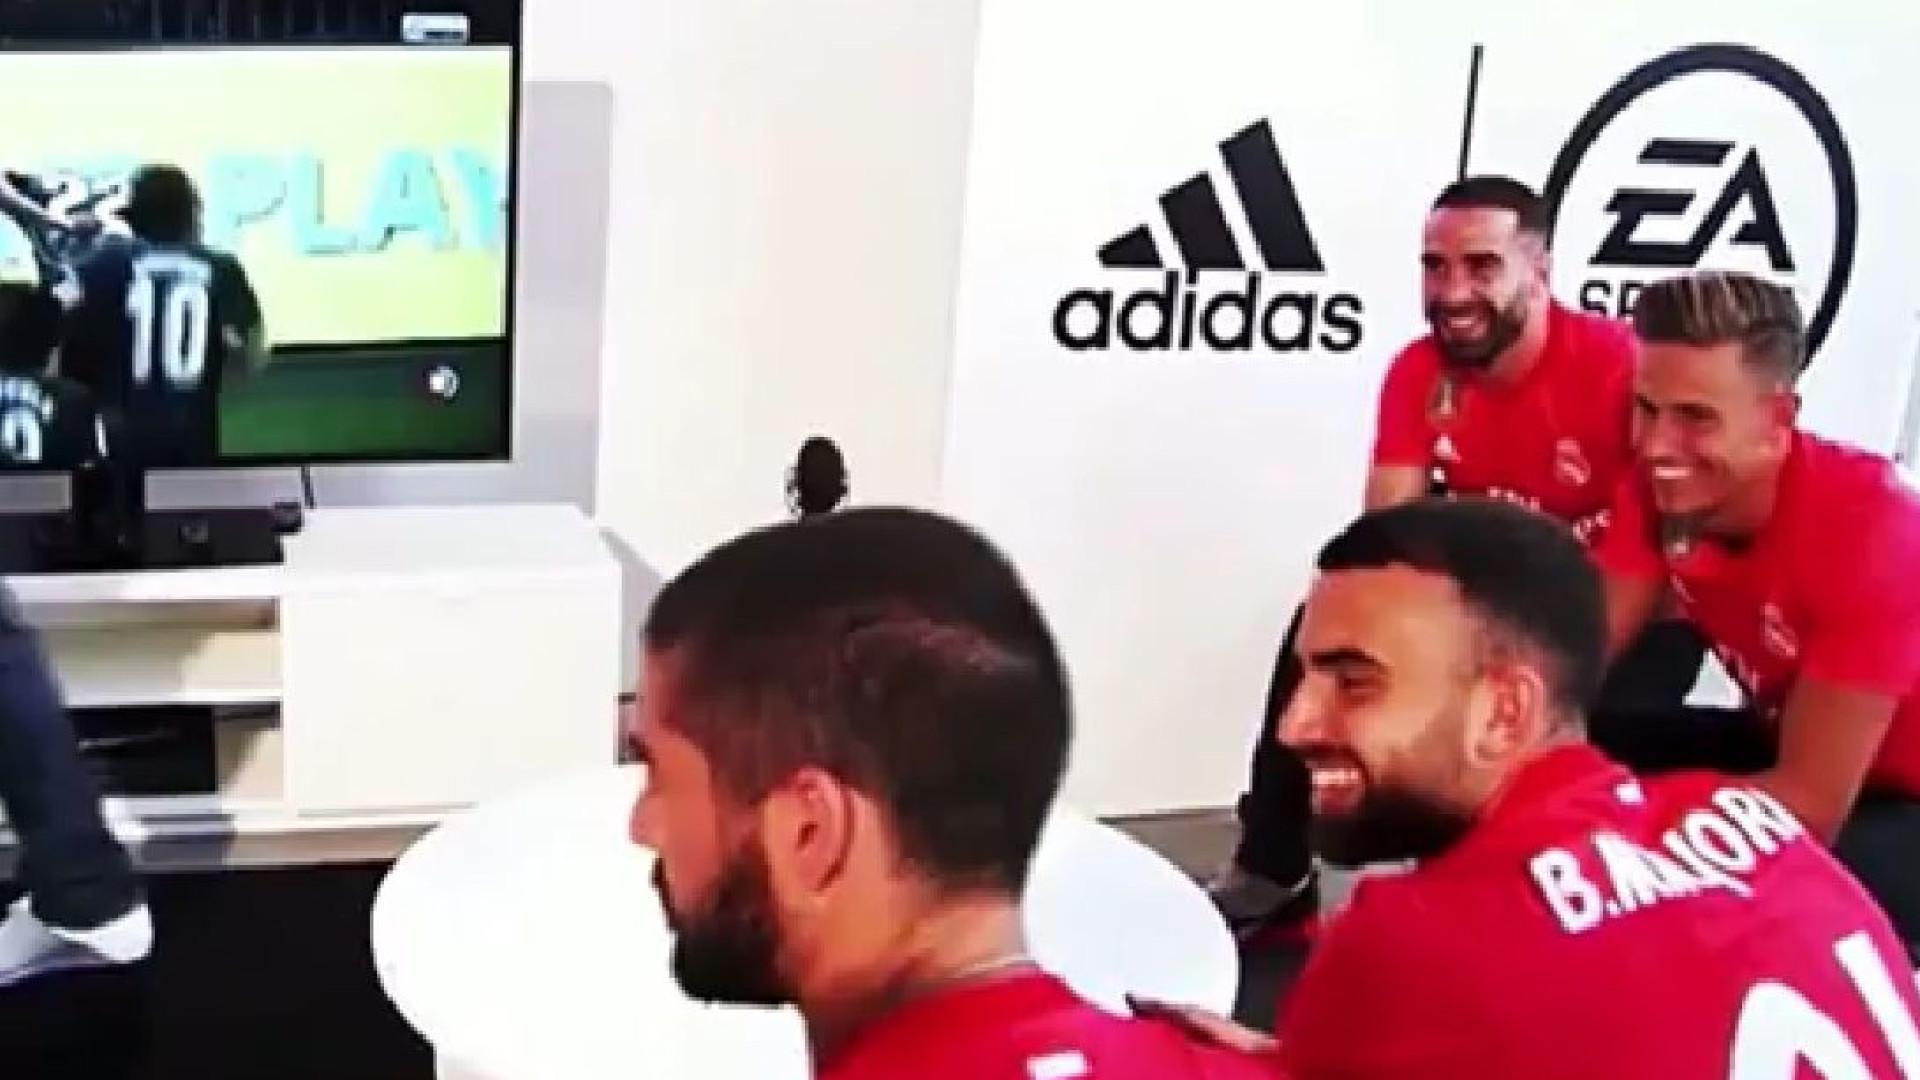 A jogar FIFA, Isco aproveitou para enviar recado a Ronaldo